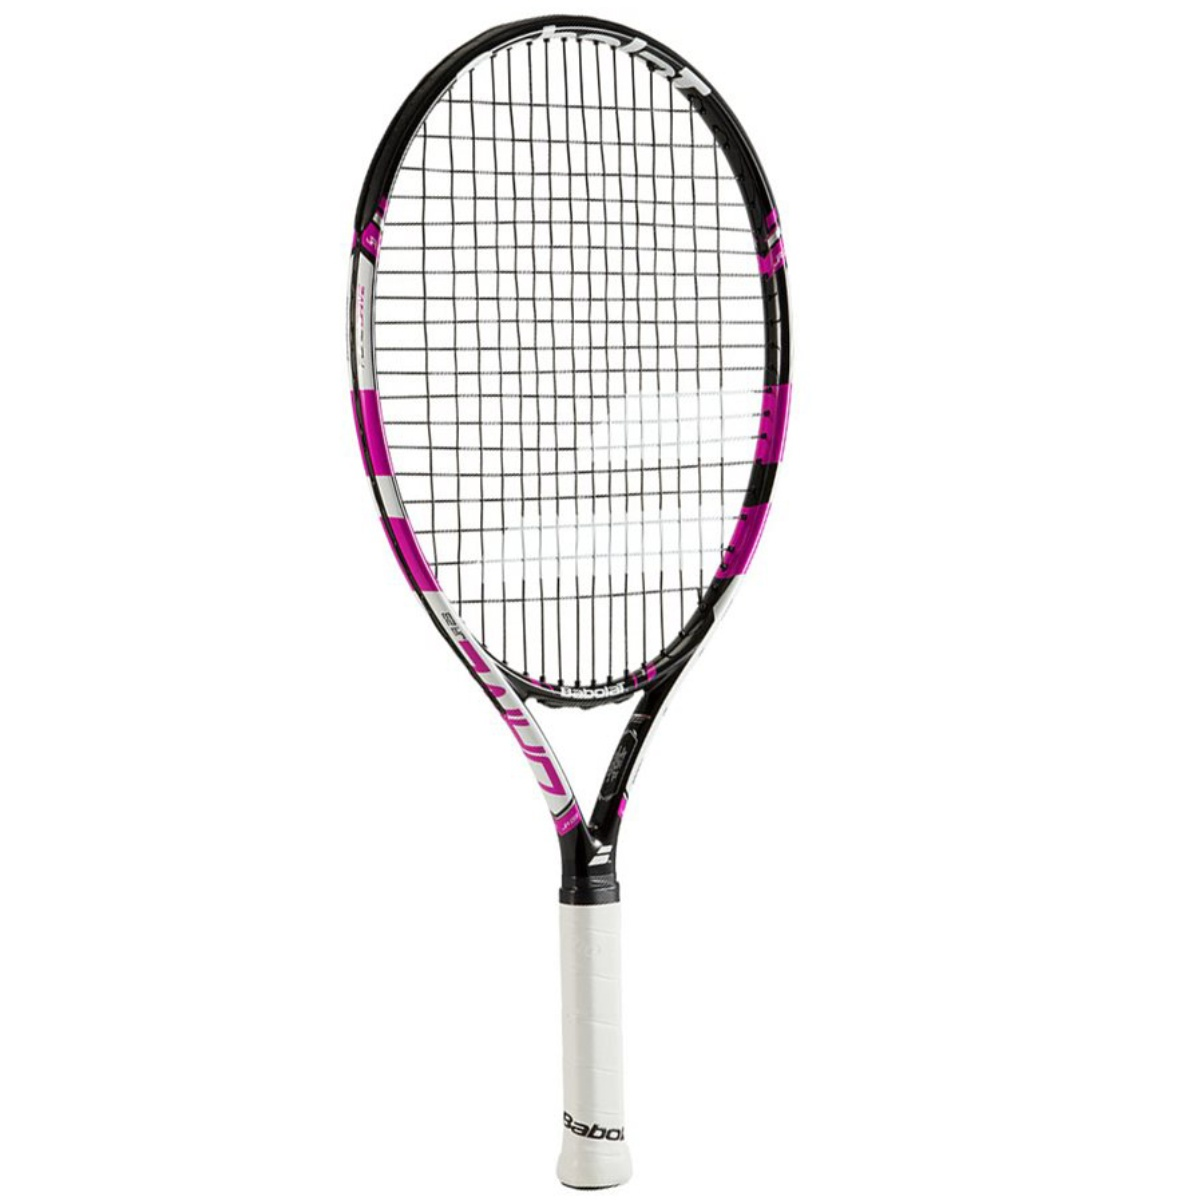 Tenisová raketa BABOLAT Pure Drive Junior 2016 růžová - vel. 23